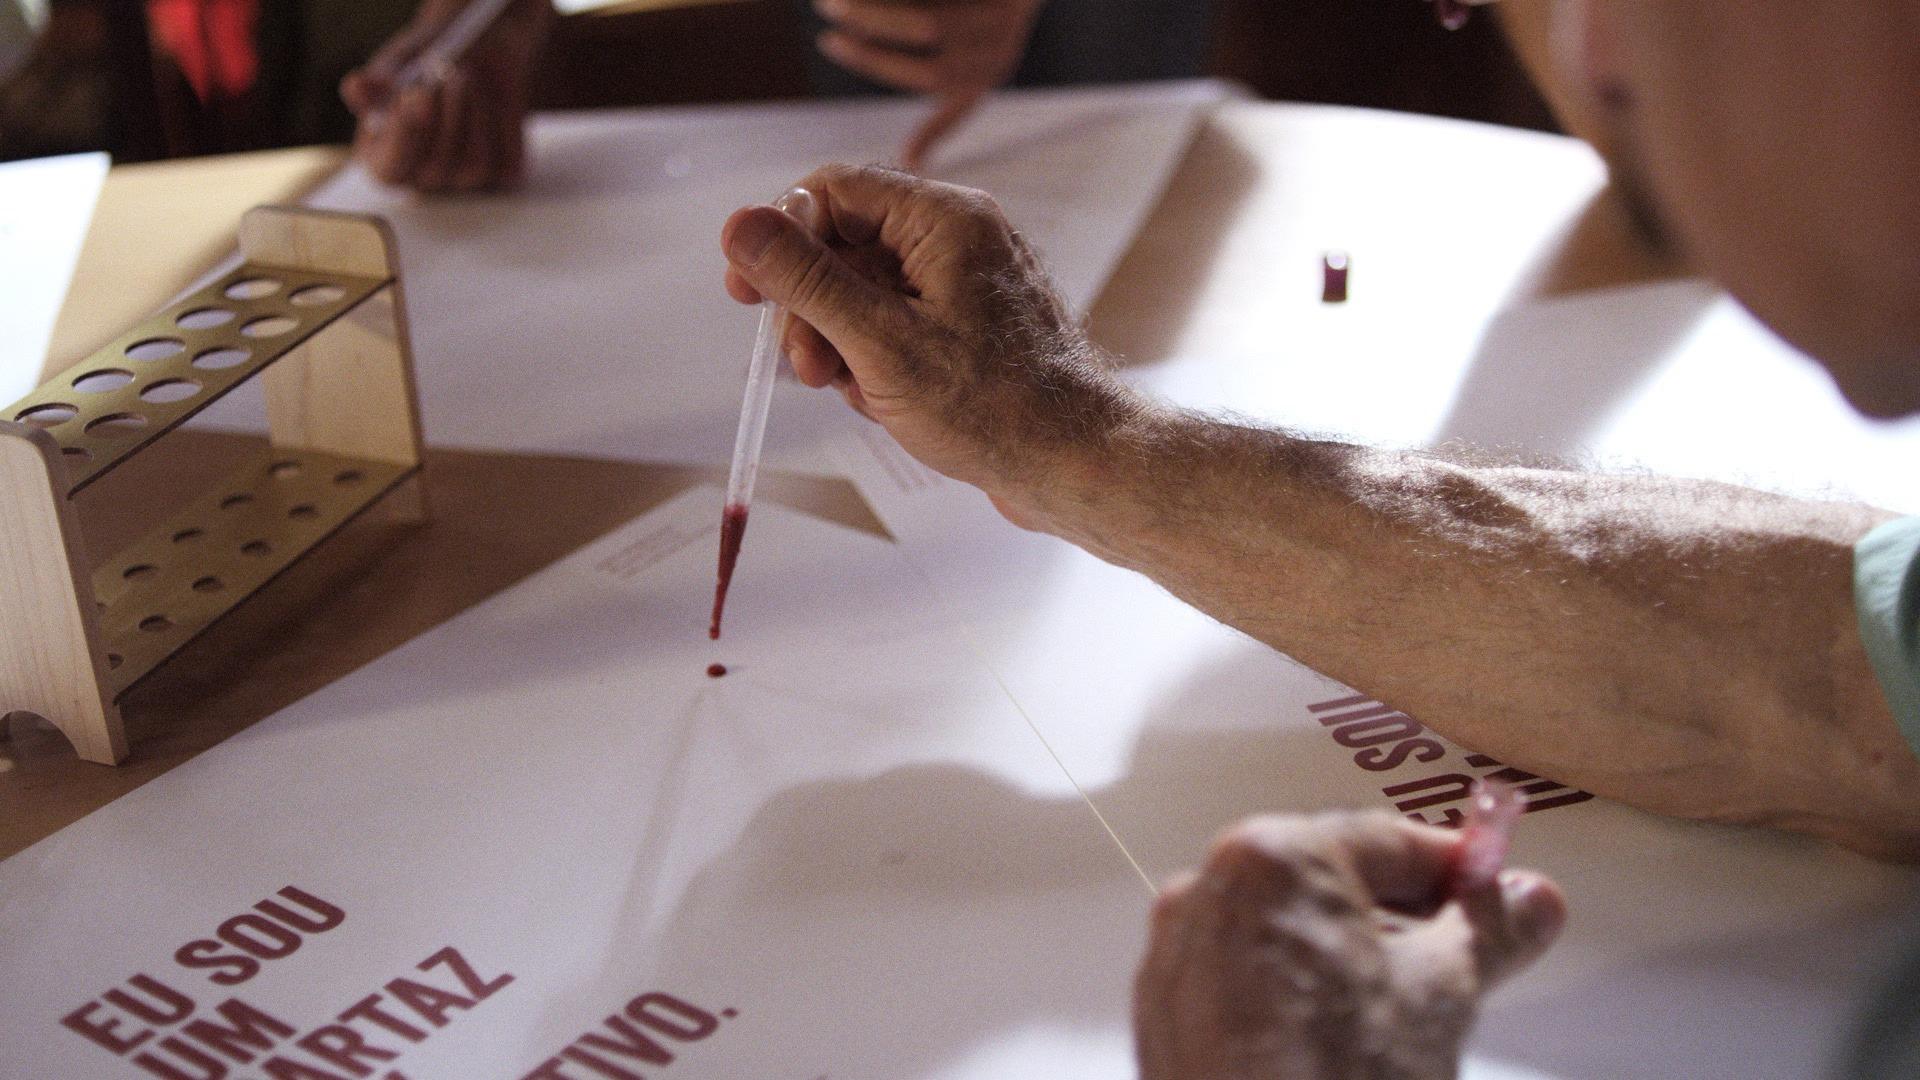 O Cartaz HIV Positivo : depoimento Micaela Cyrino